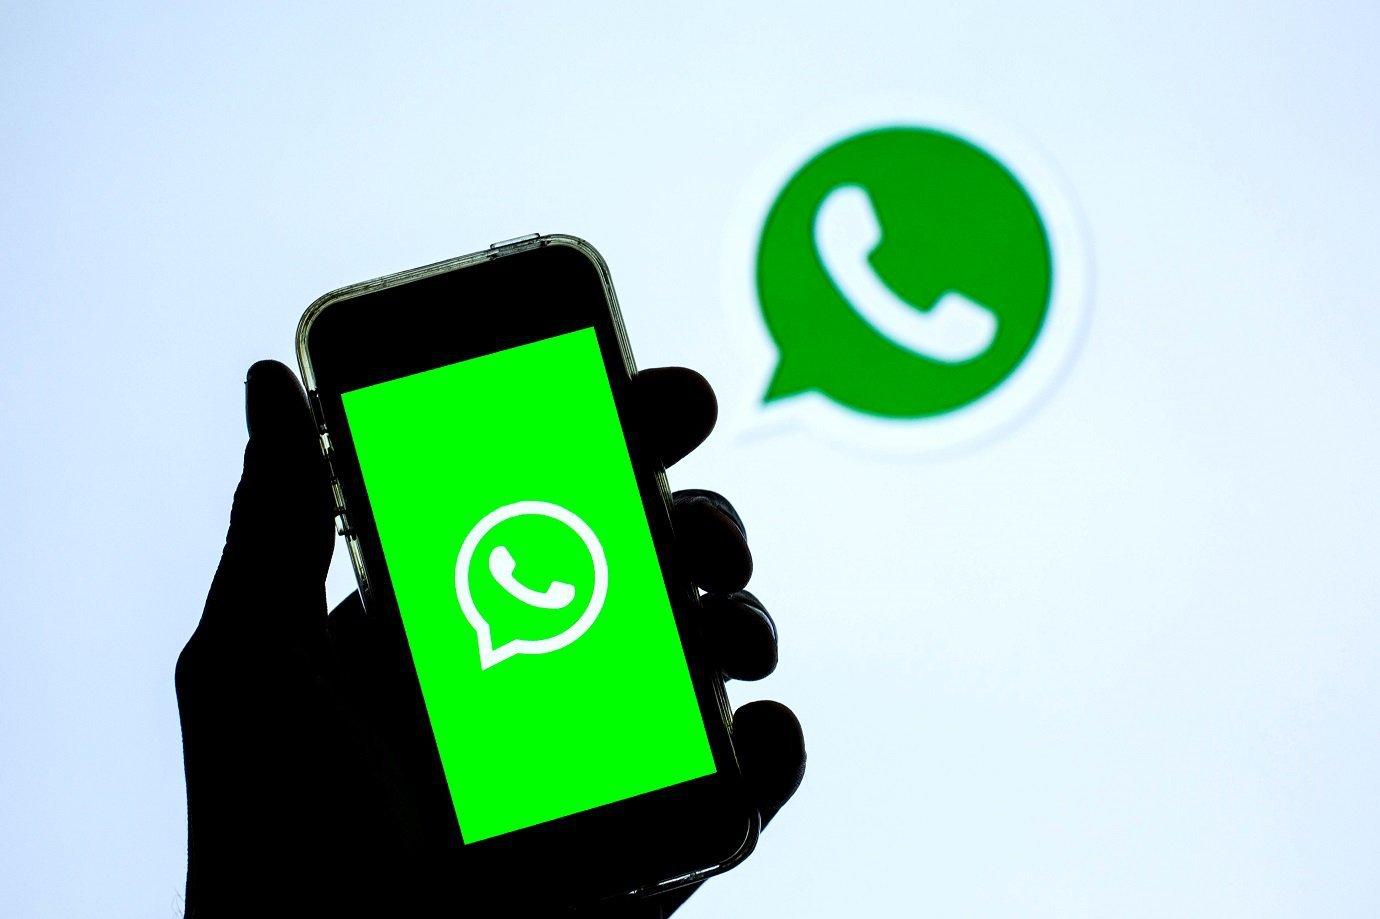 WhatsApp lança busca de empresas dentro do aplicativo